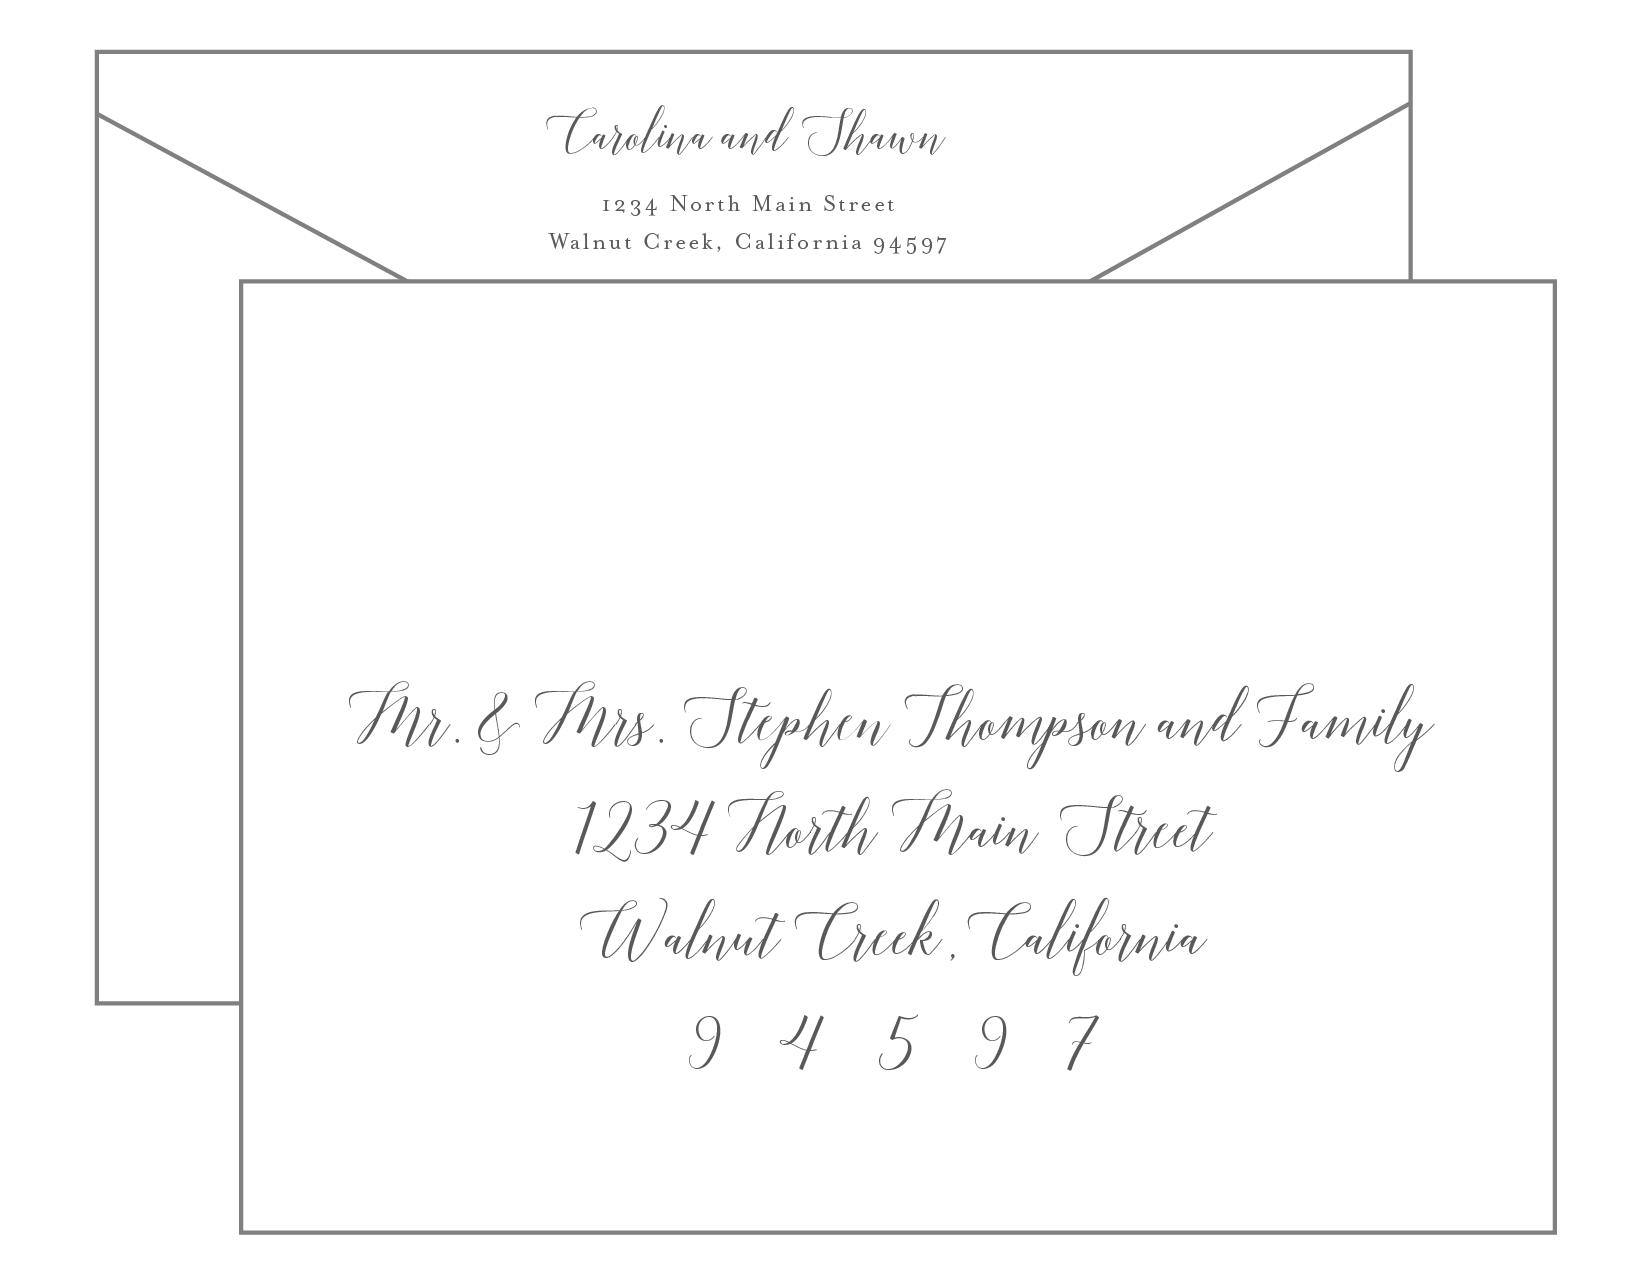 Outer Envelopes